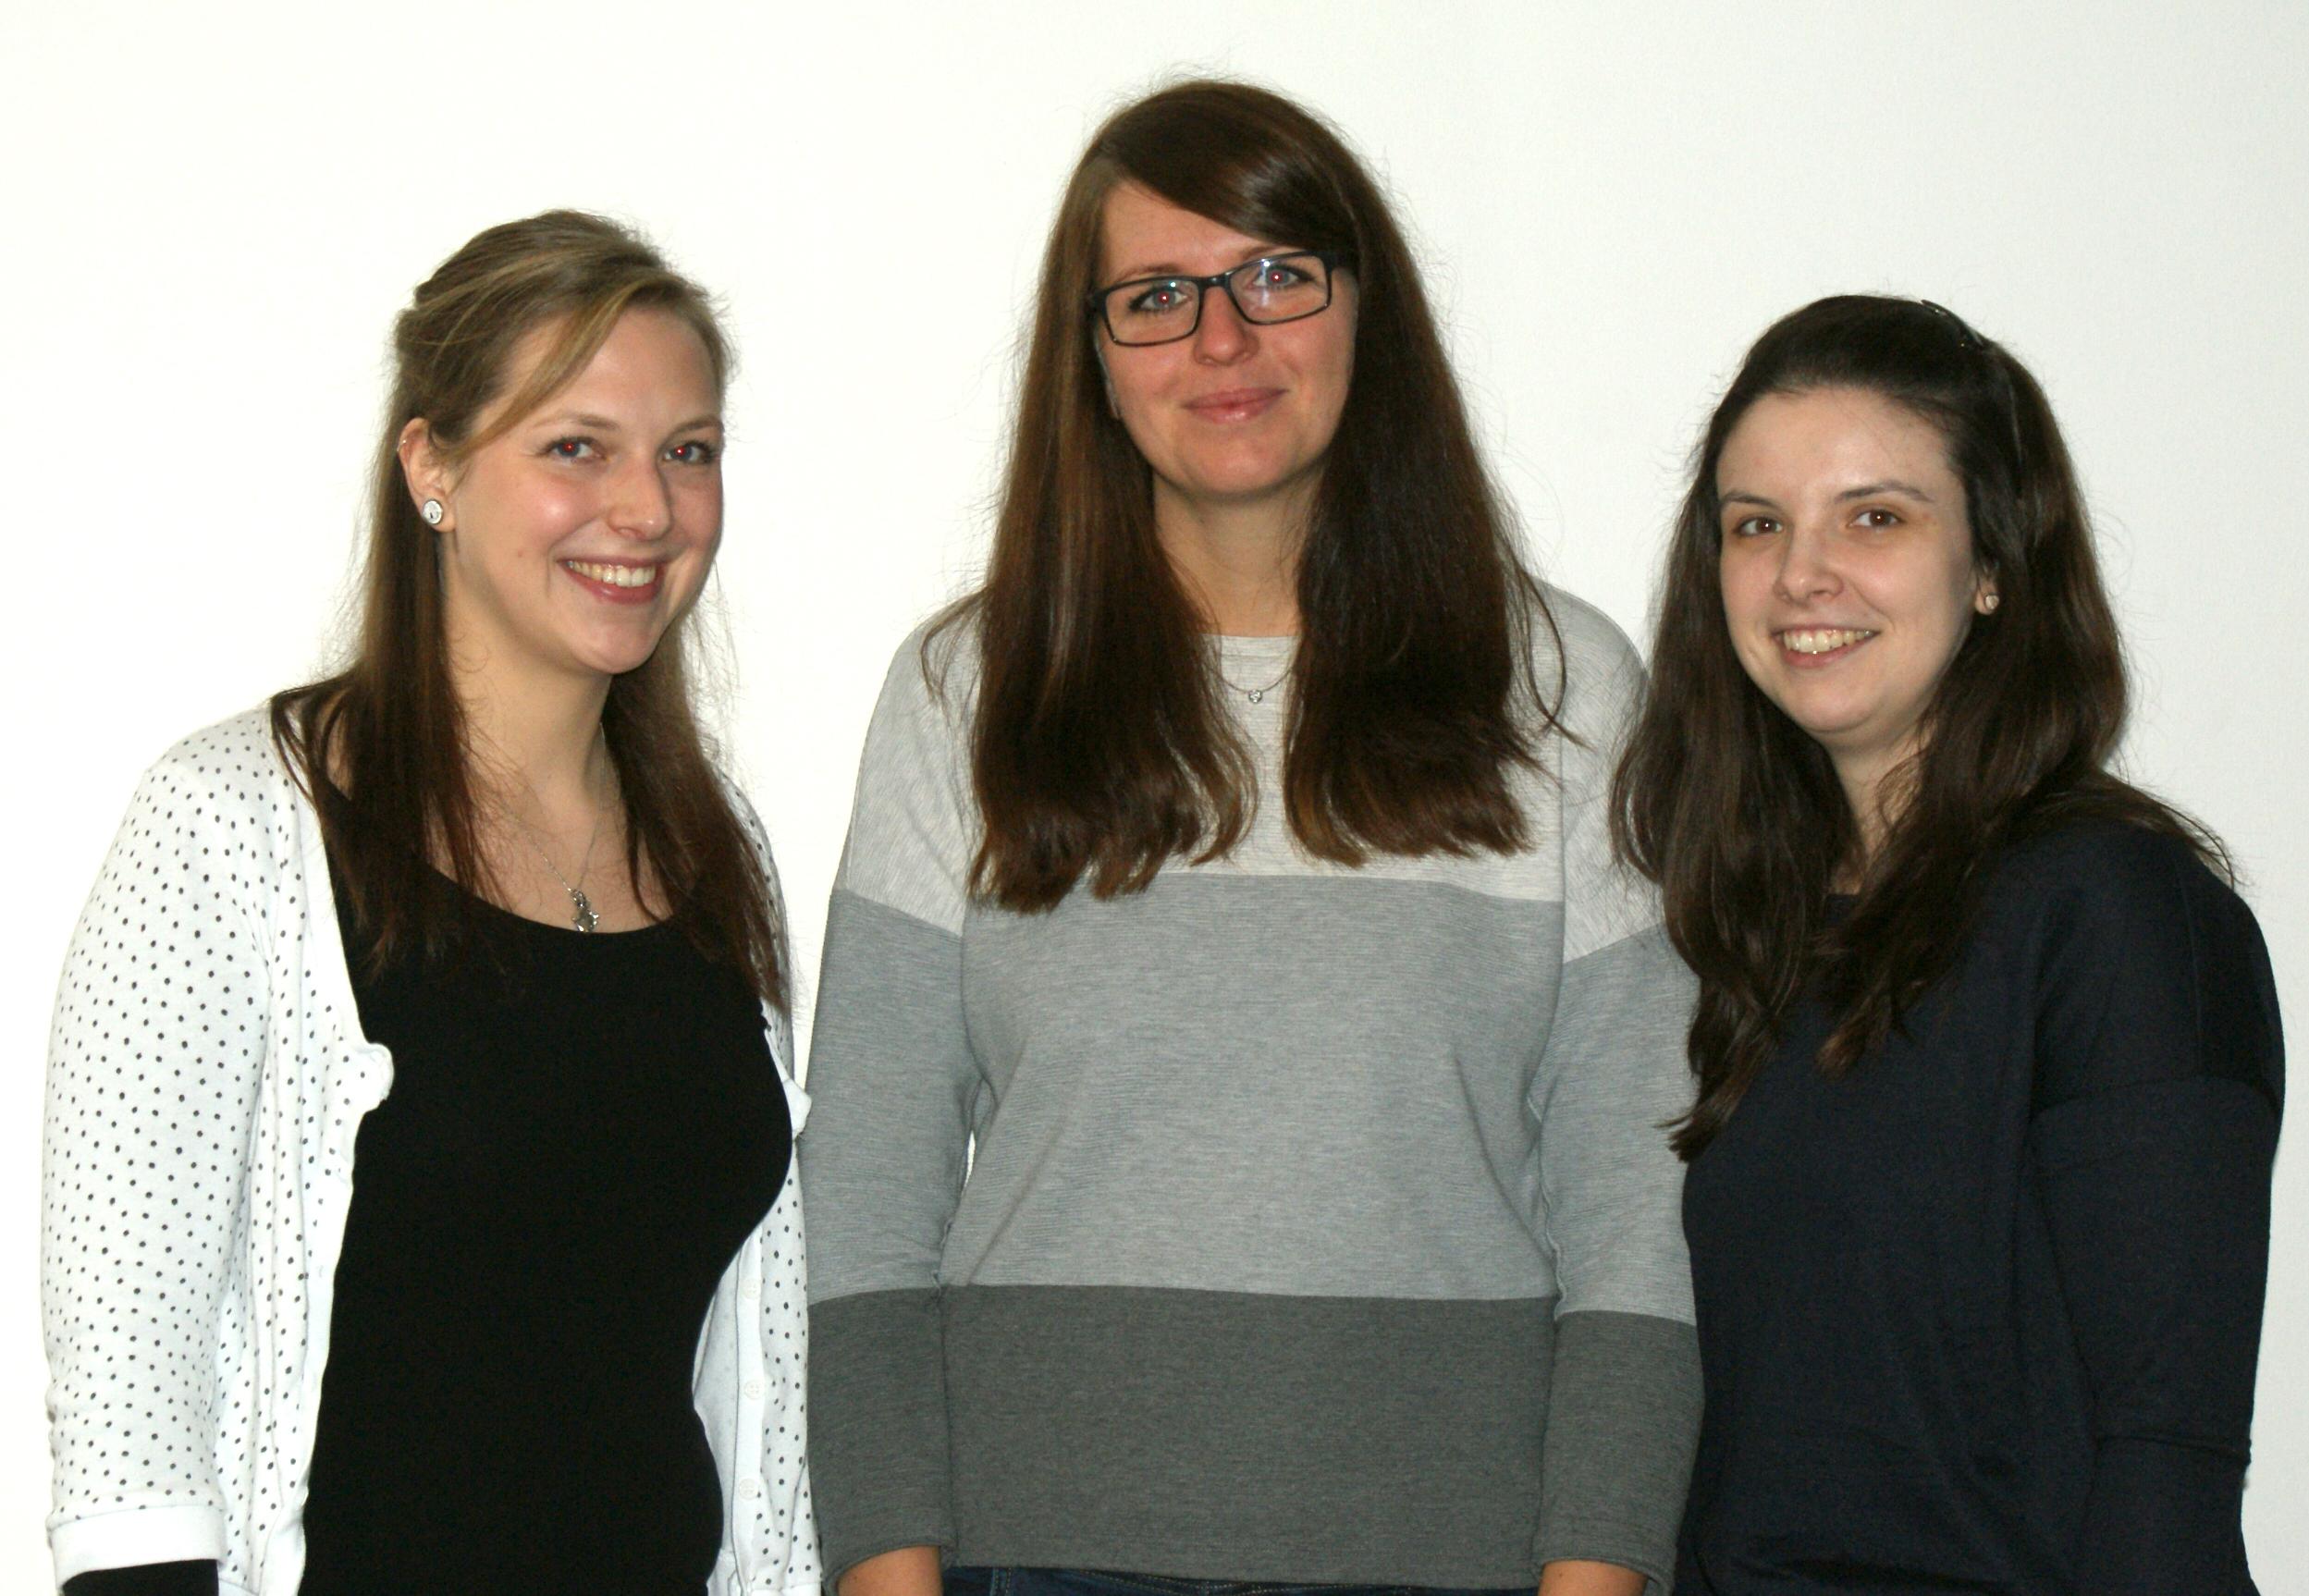 v.l.n.r.: Sarah-Katharina Schmidt, Anna Wilke, Carina Esser